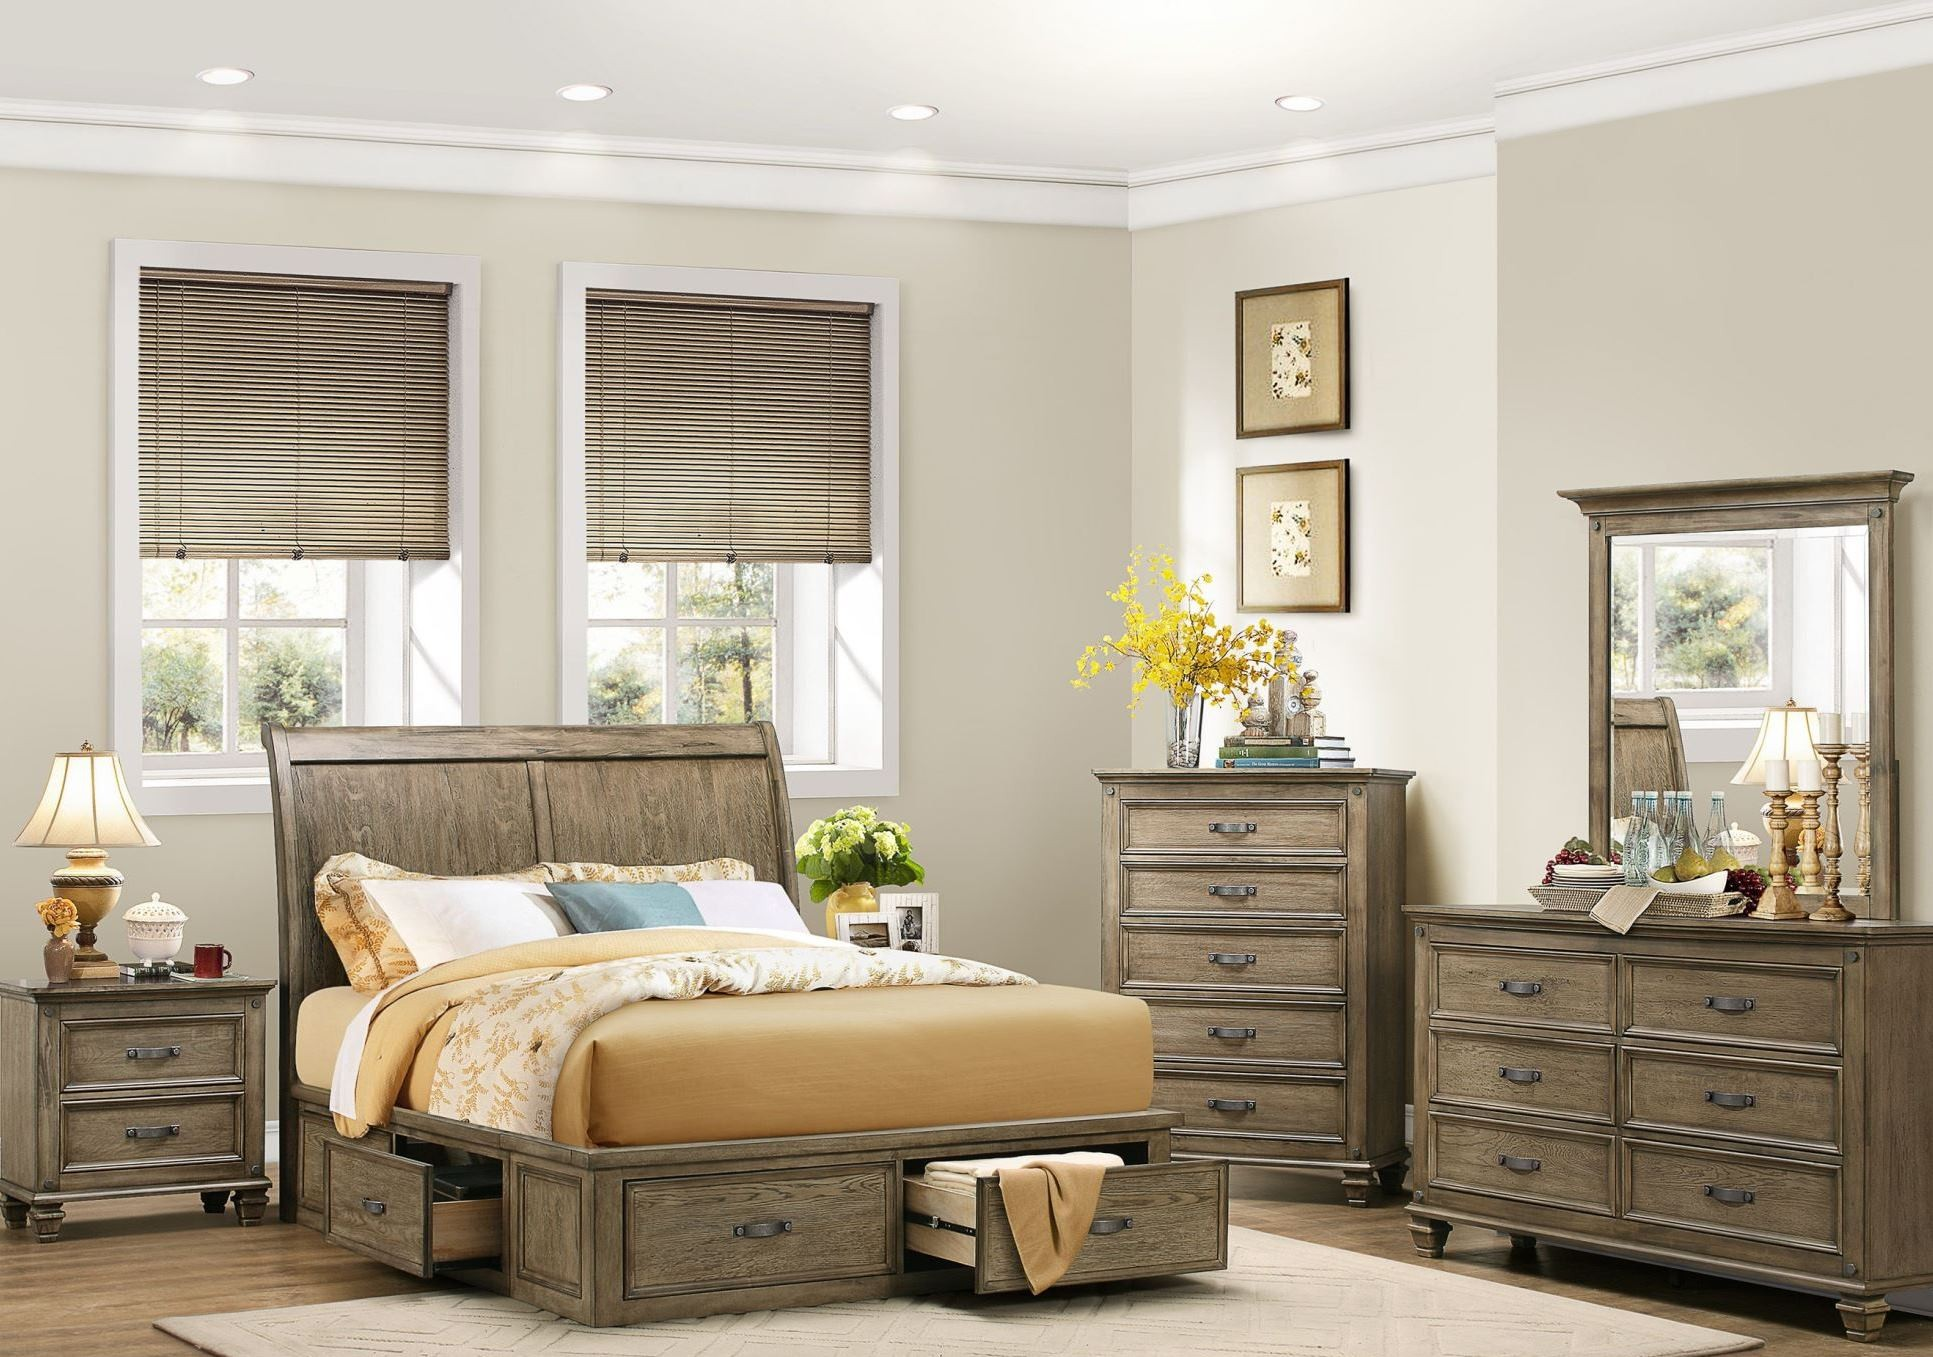 Sylvania Driftwood Platform Storage Bedroom Set from